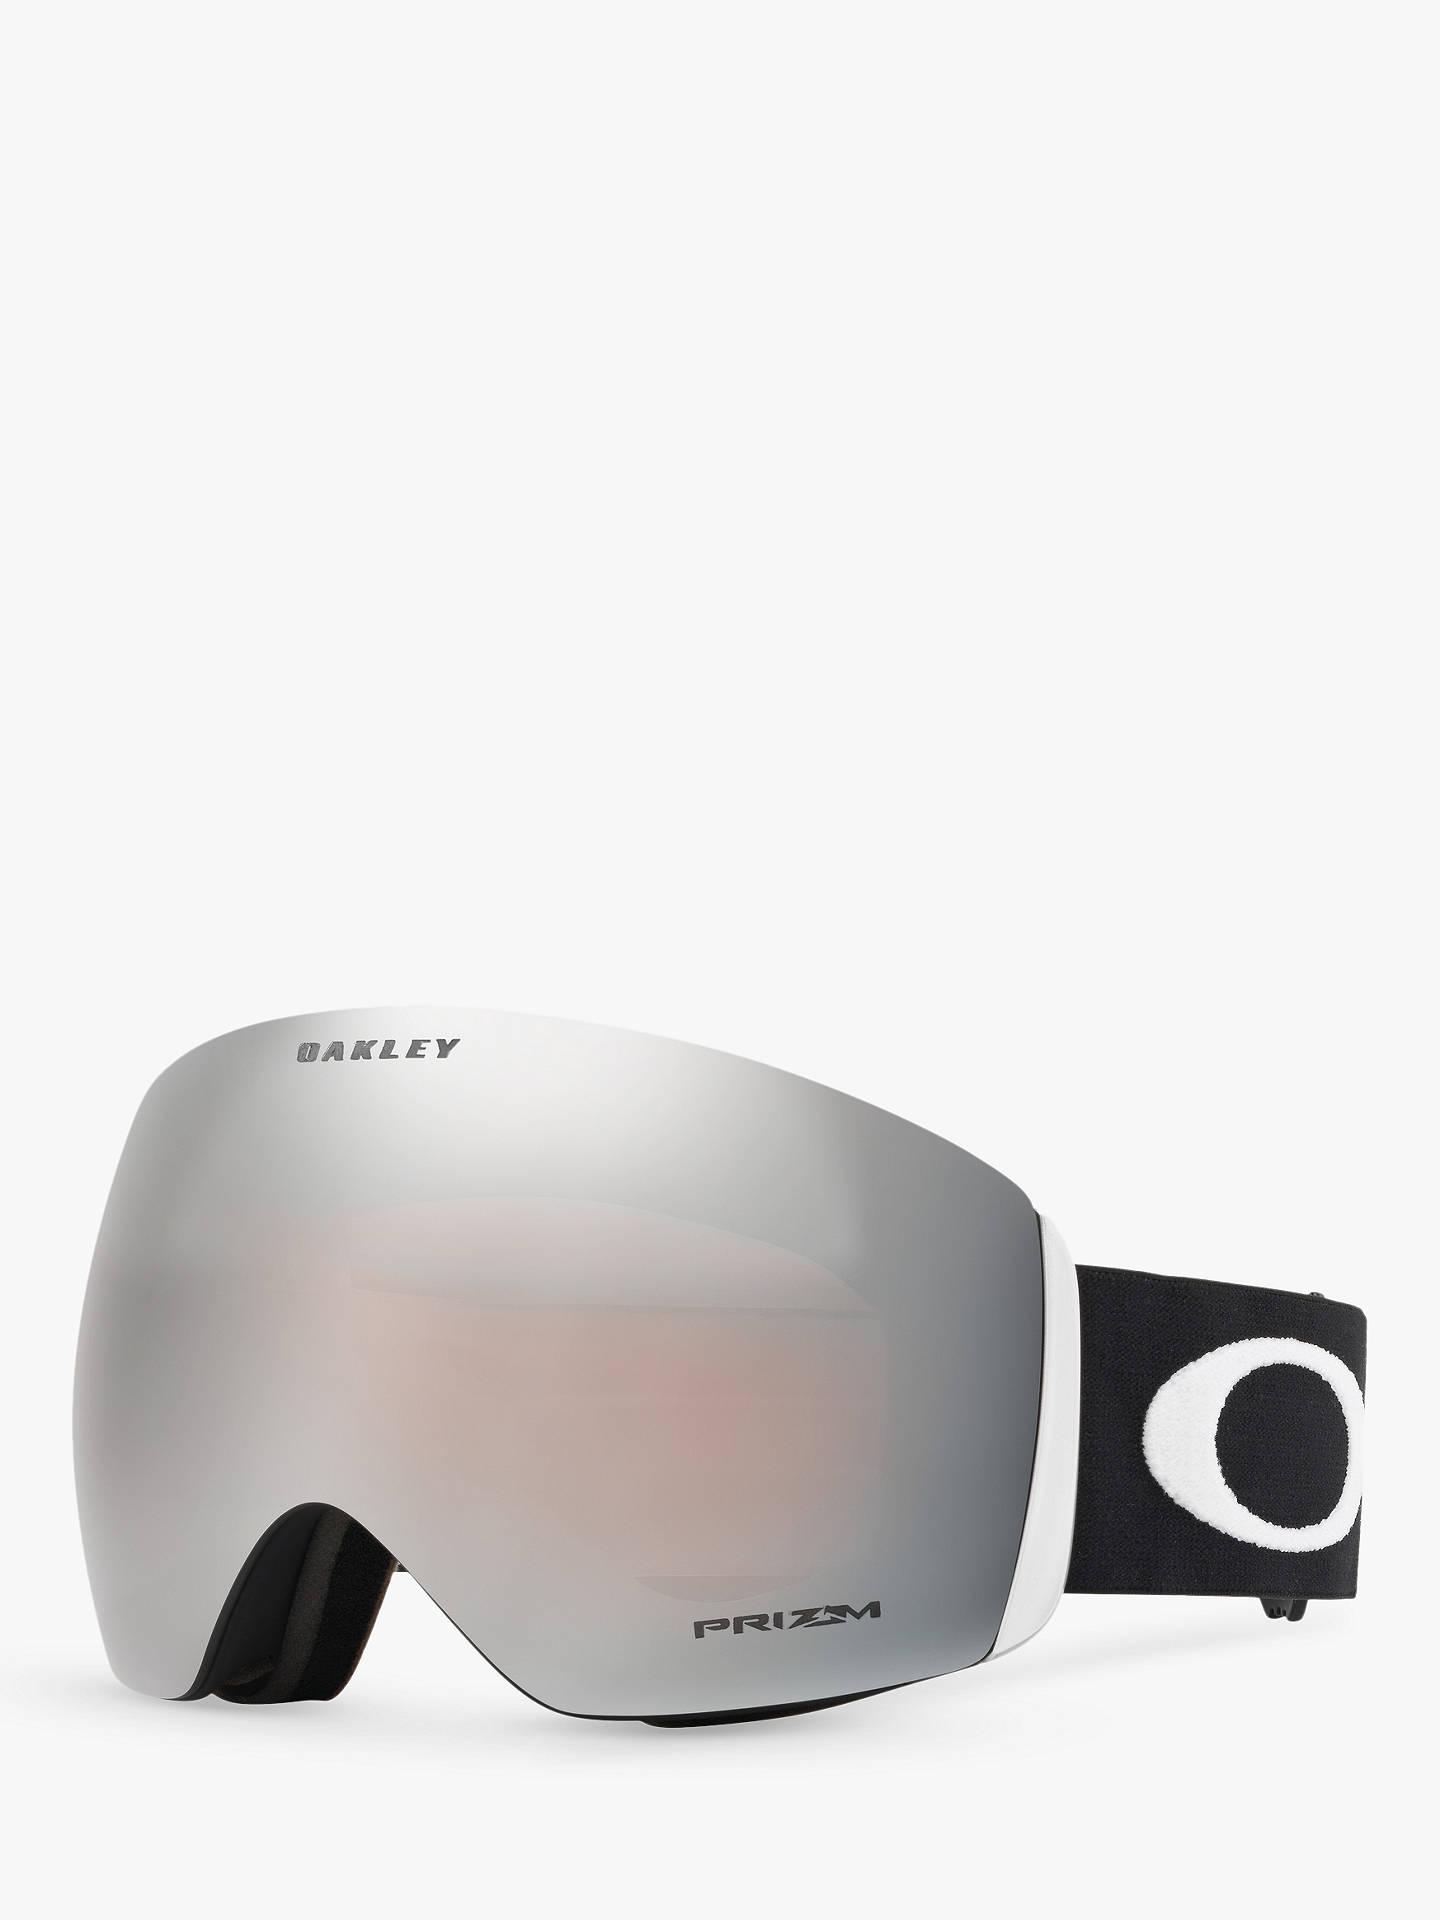 c92c0103df7 Oakley OO7050 Unisex Flight Deck Prizm Ski Goggles at John Lewis ...